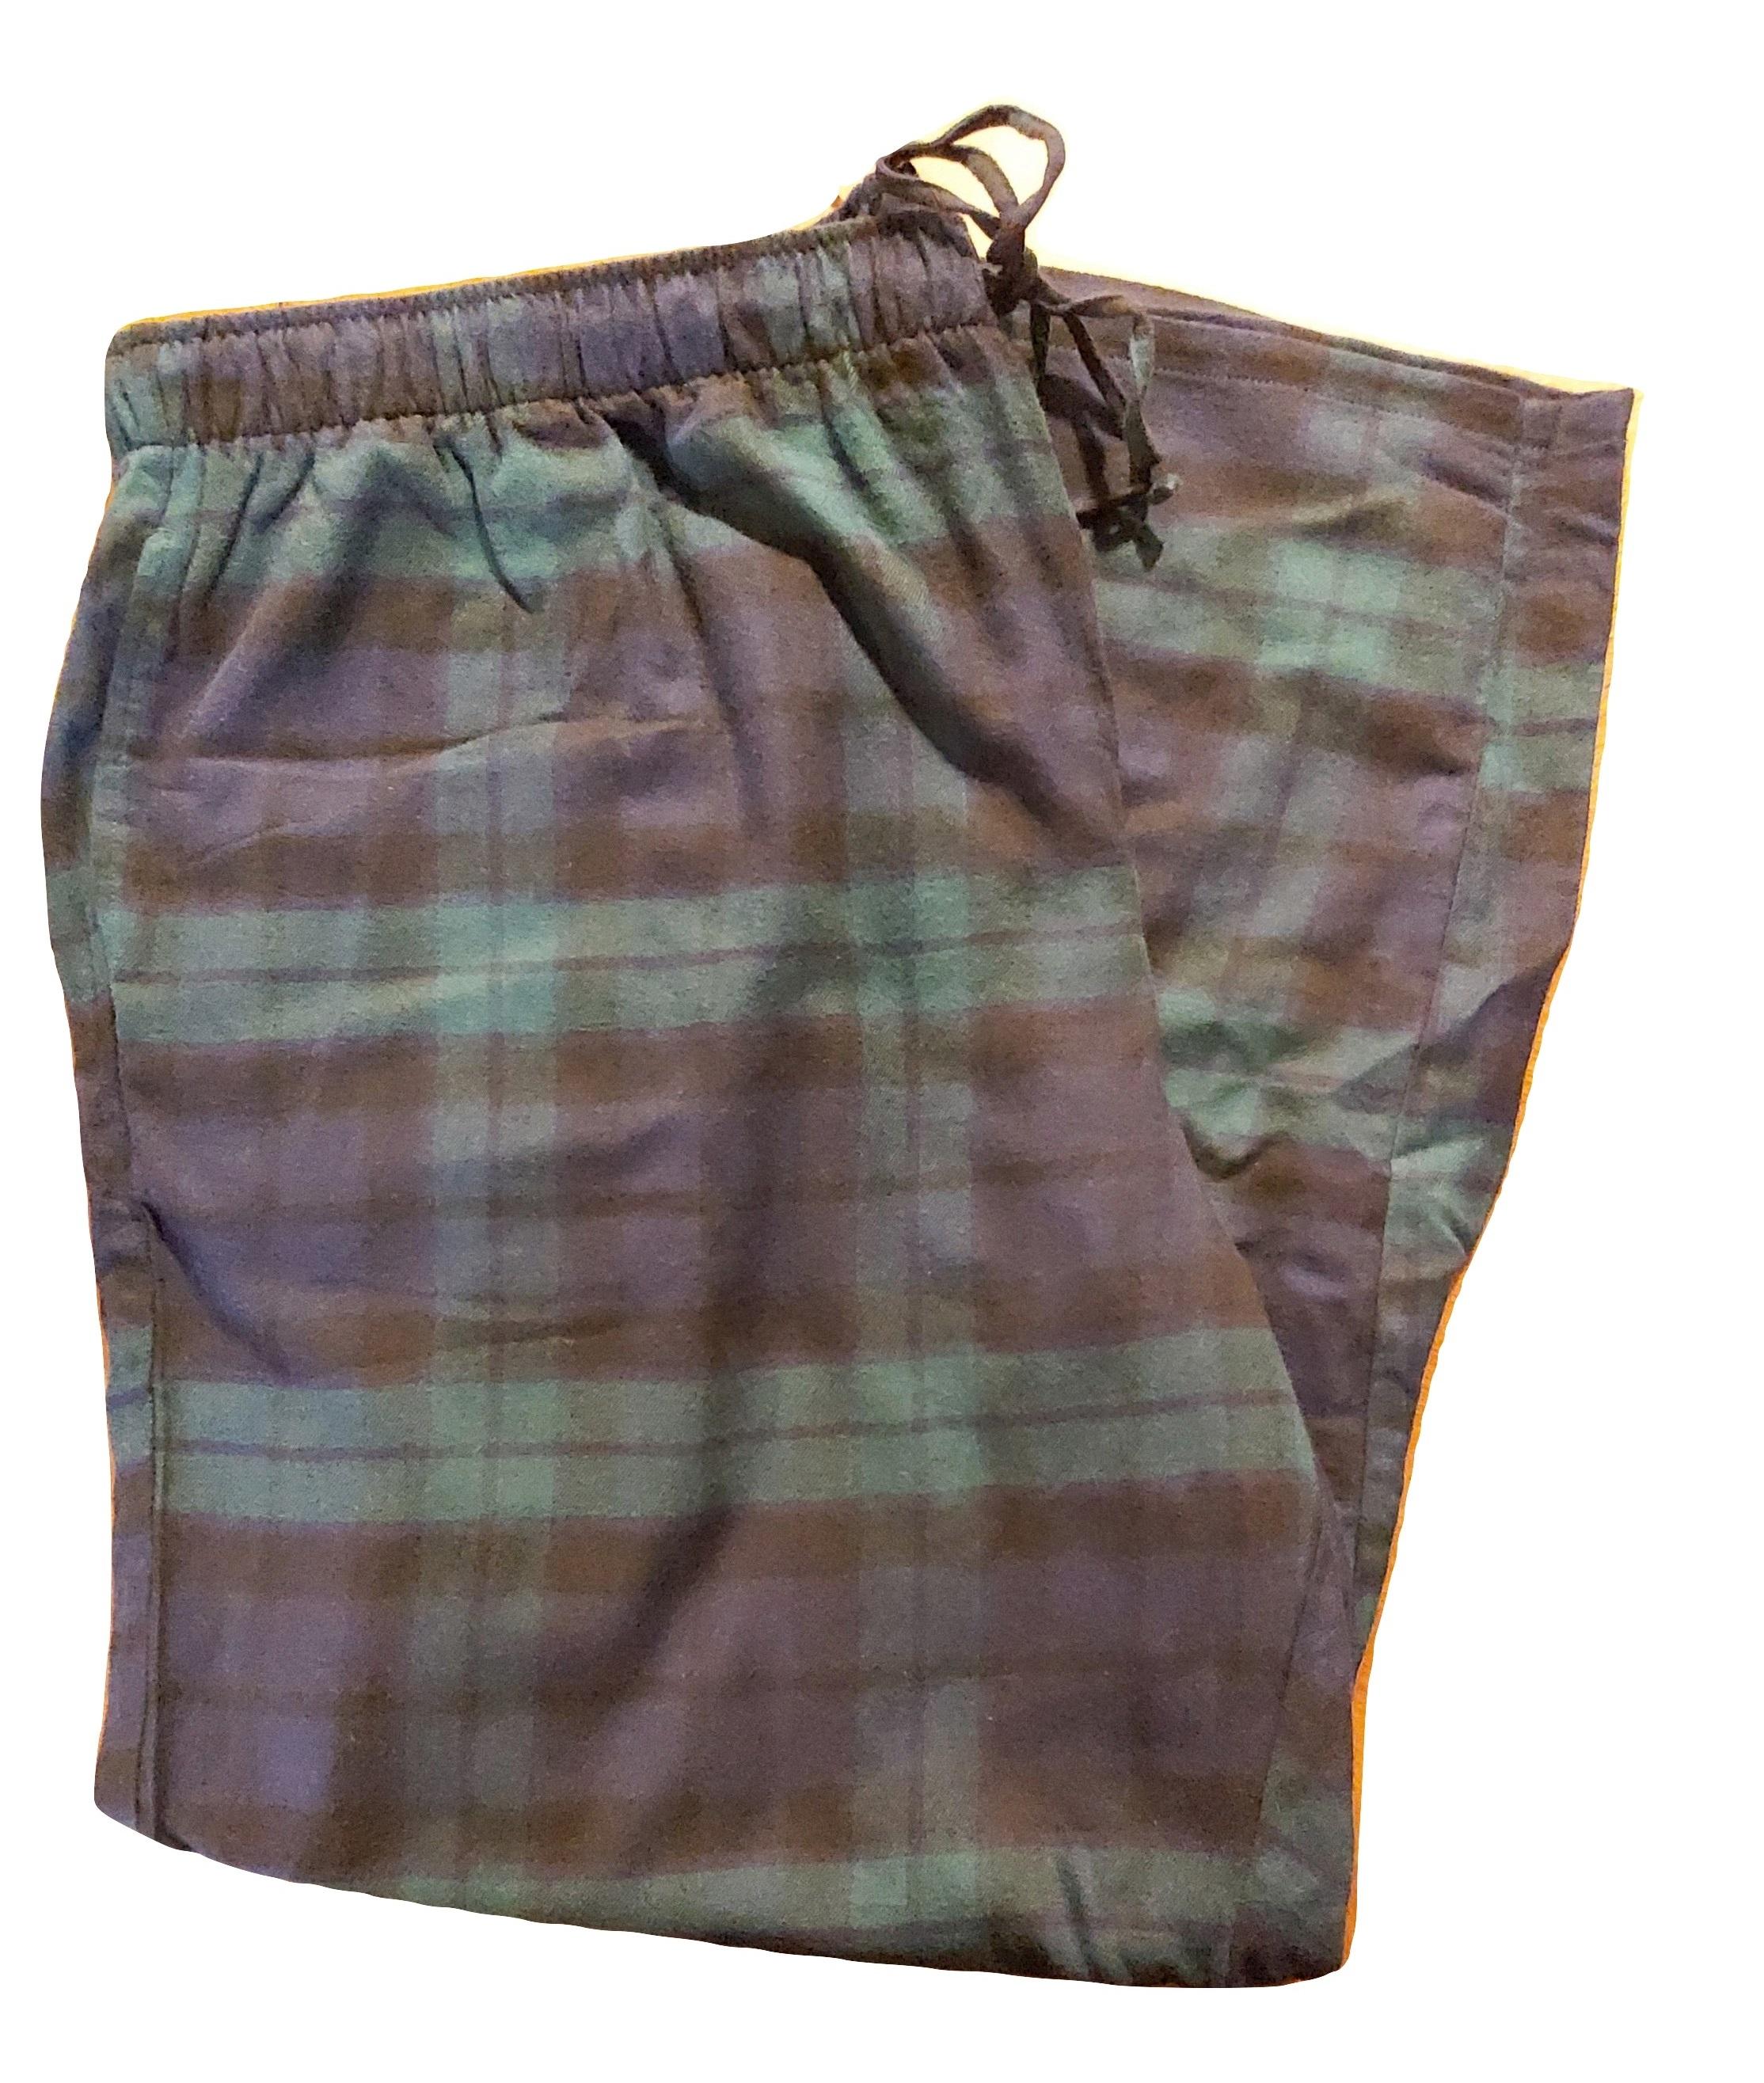 Wisconsin Plaid Lands End Men/'s Flannel Pajama Lounge Pants Drawstring NWOT